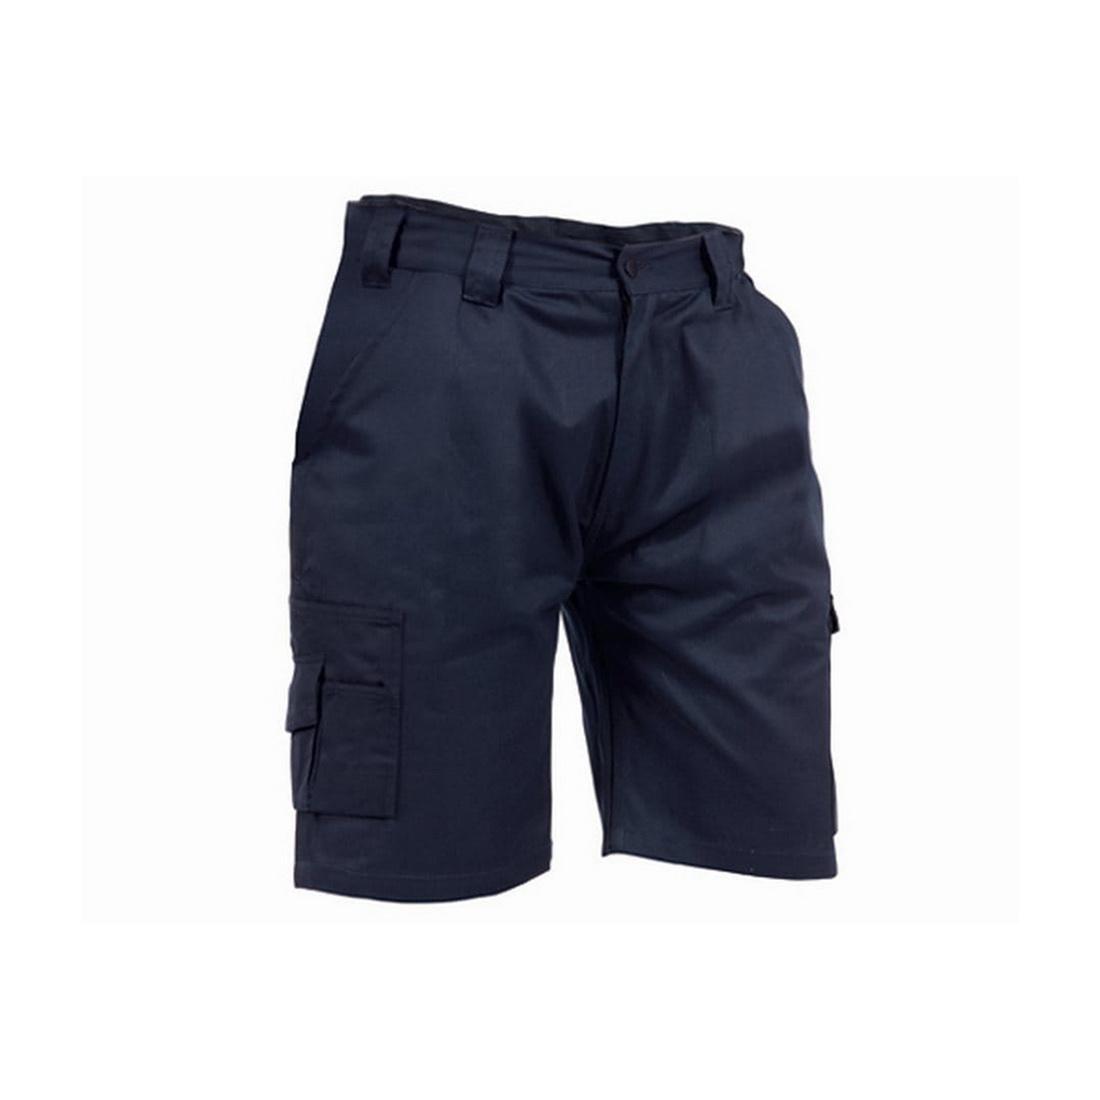 TWZ Industry Cargo Shorts Navy 112cm